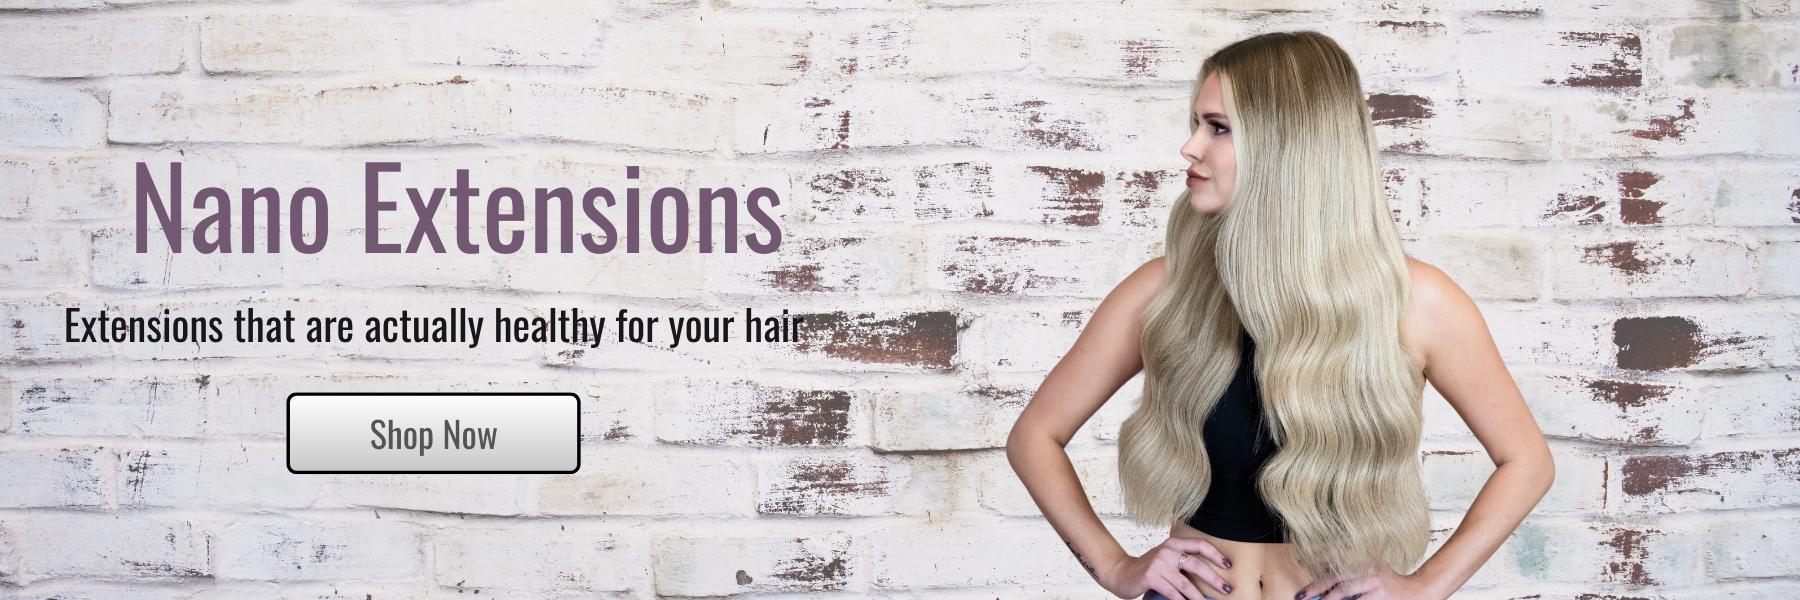 nano-hair-extensions34.png